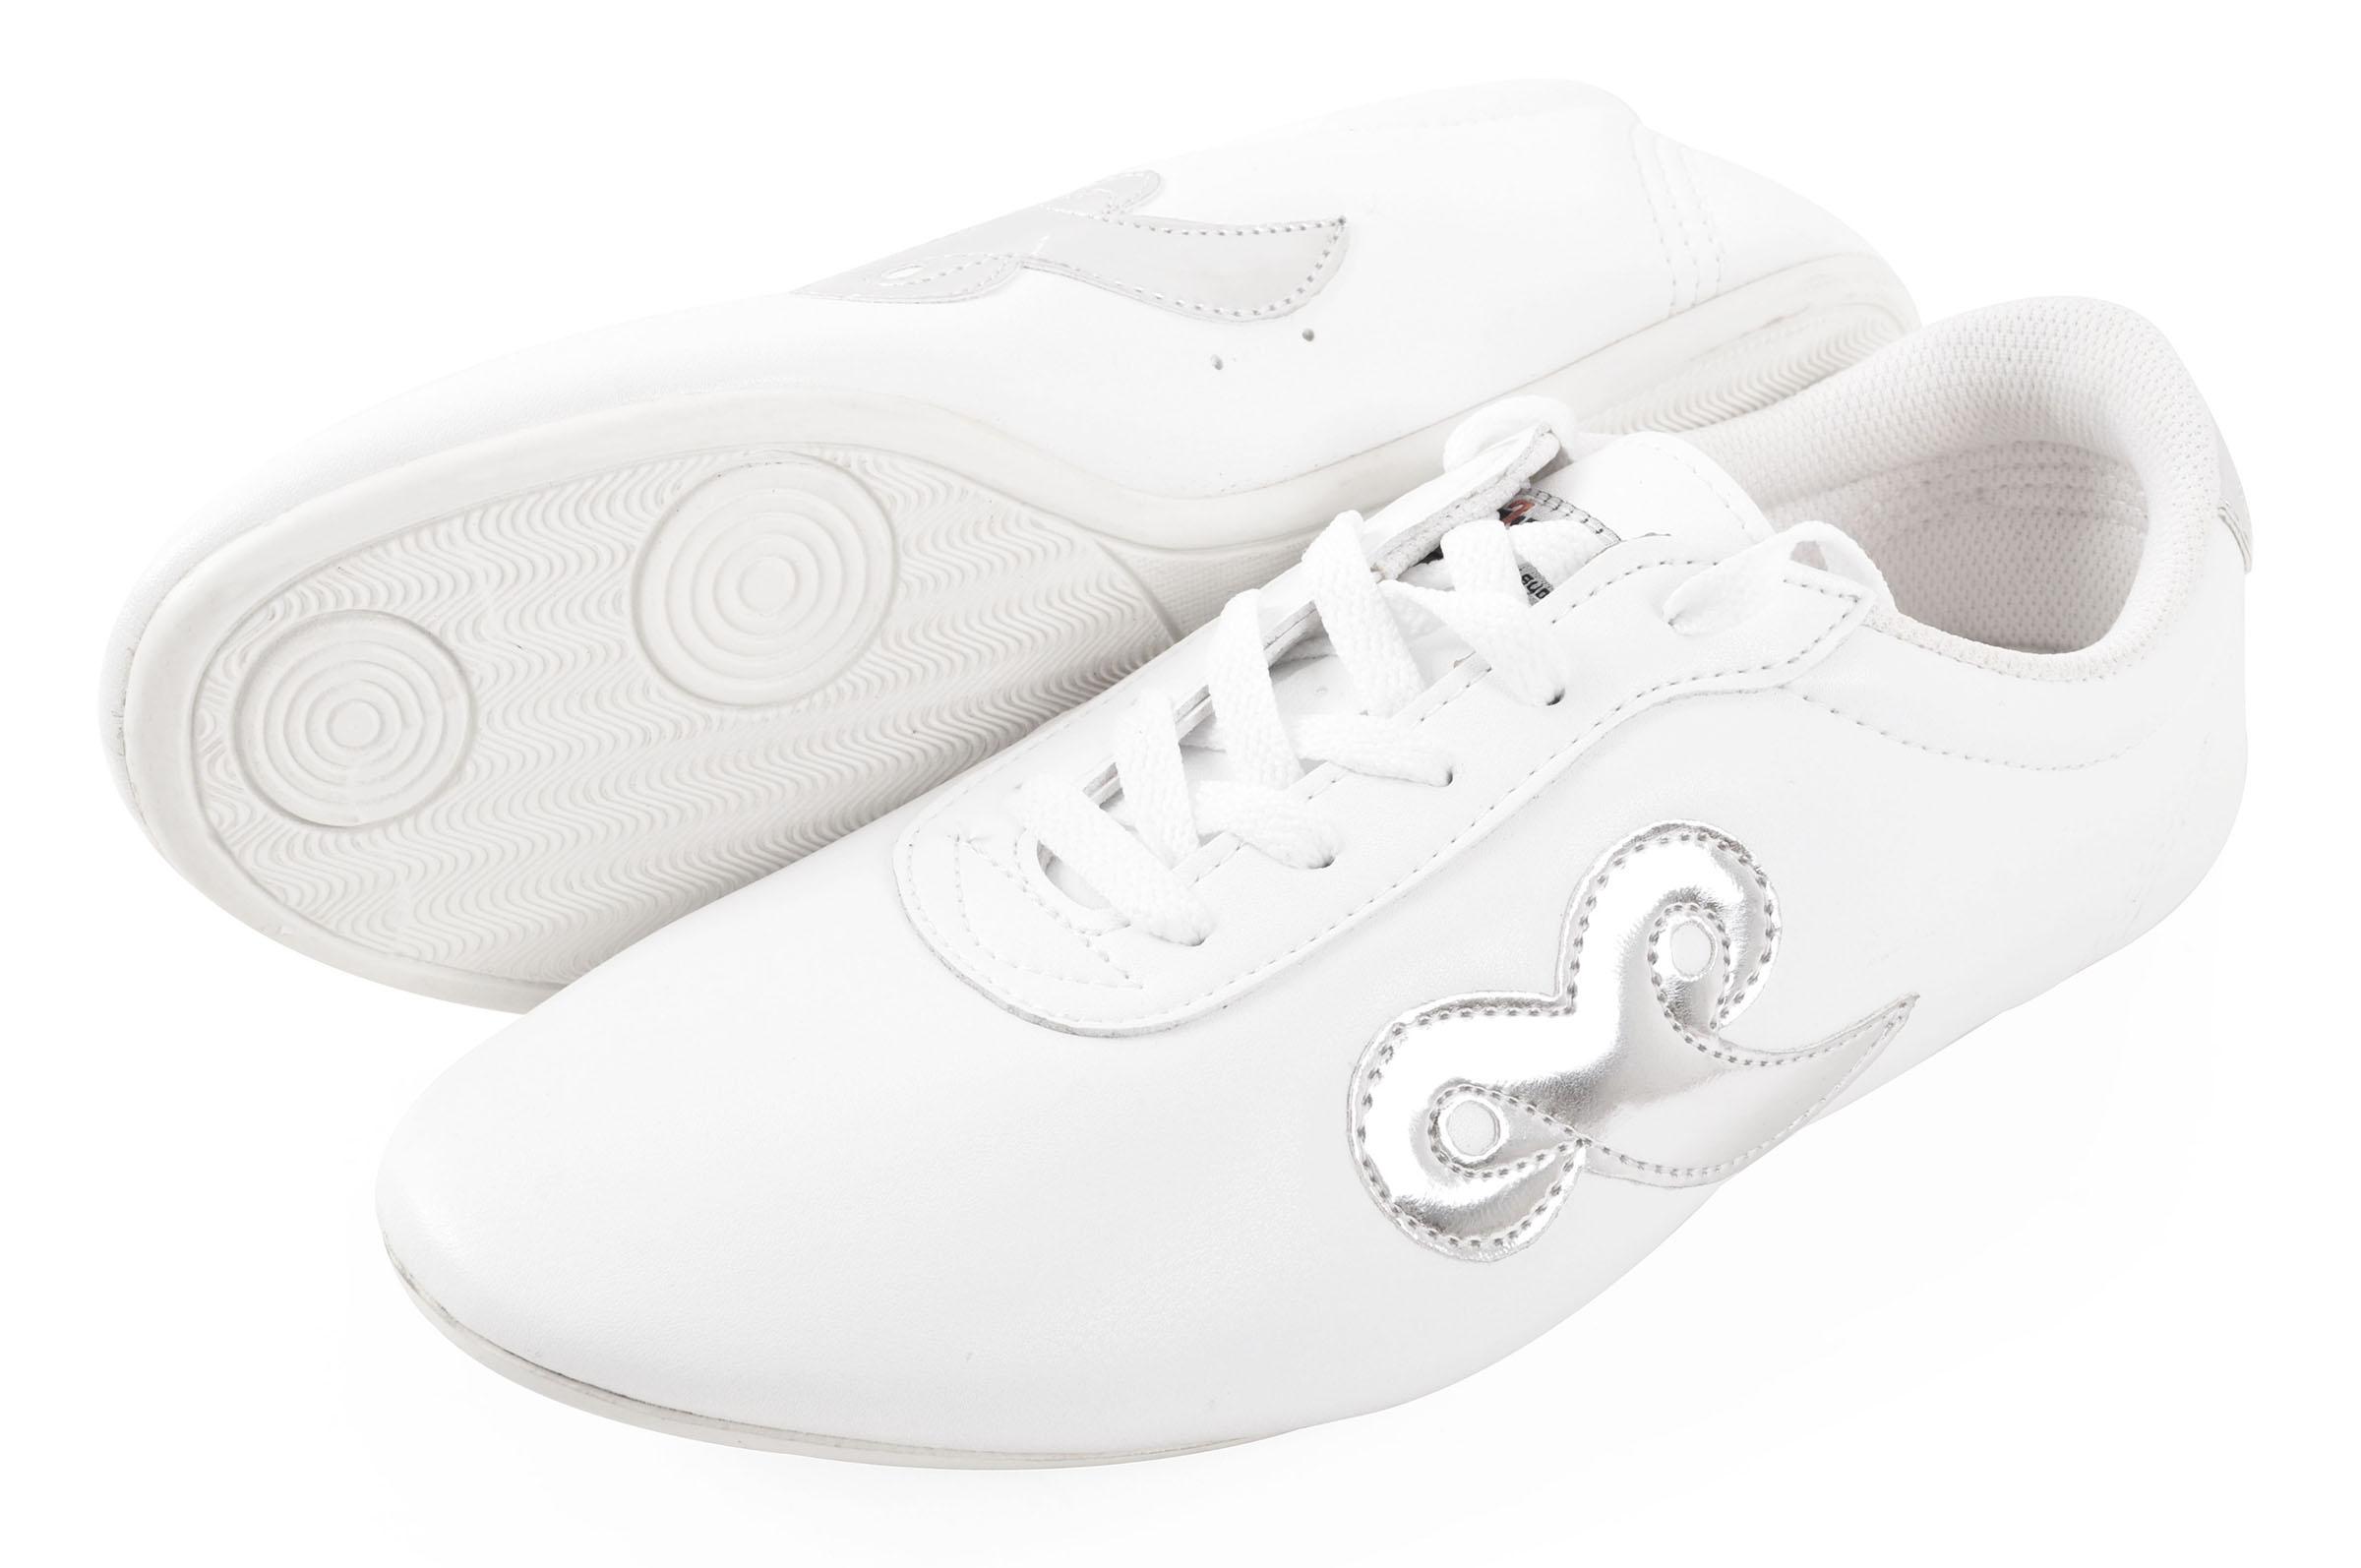 Chaussures Wushu «Budosaga», Blanches